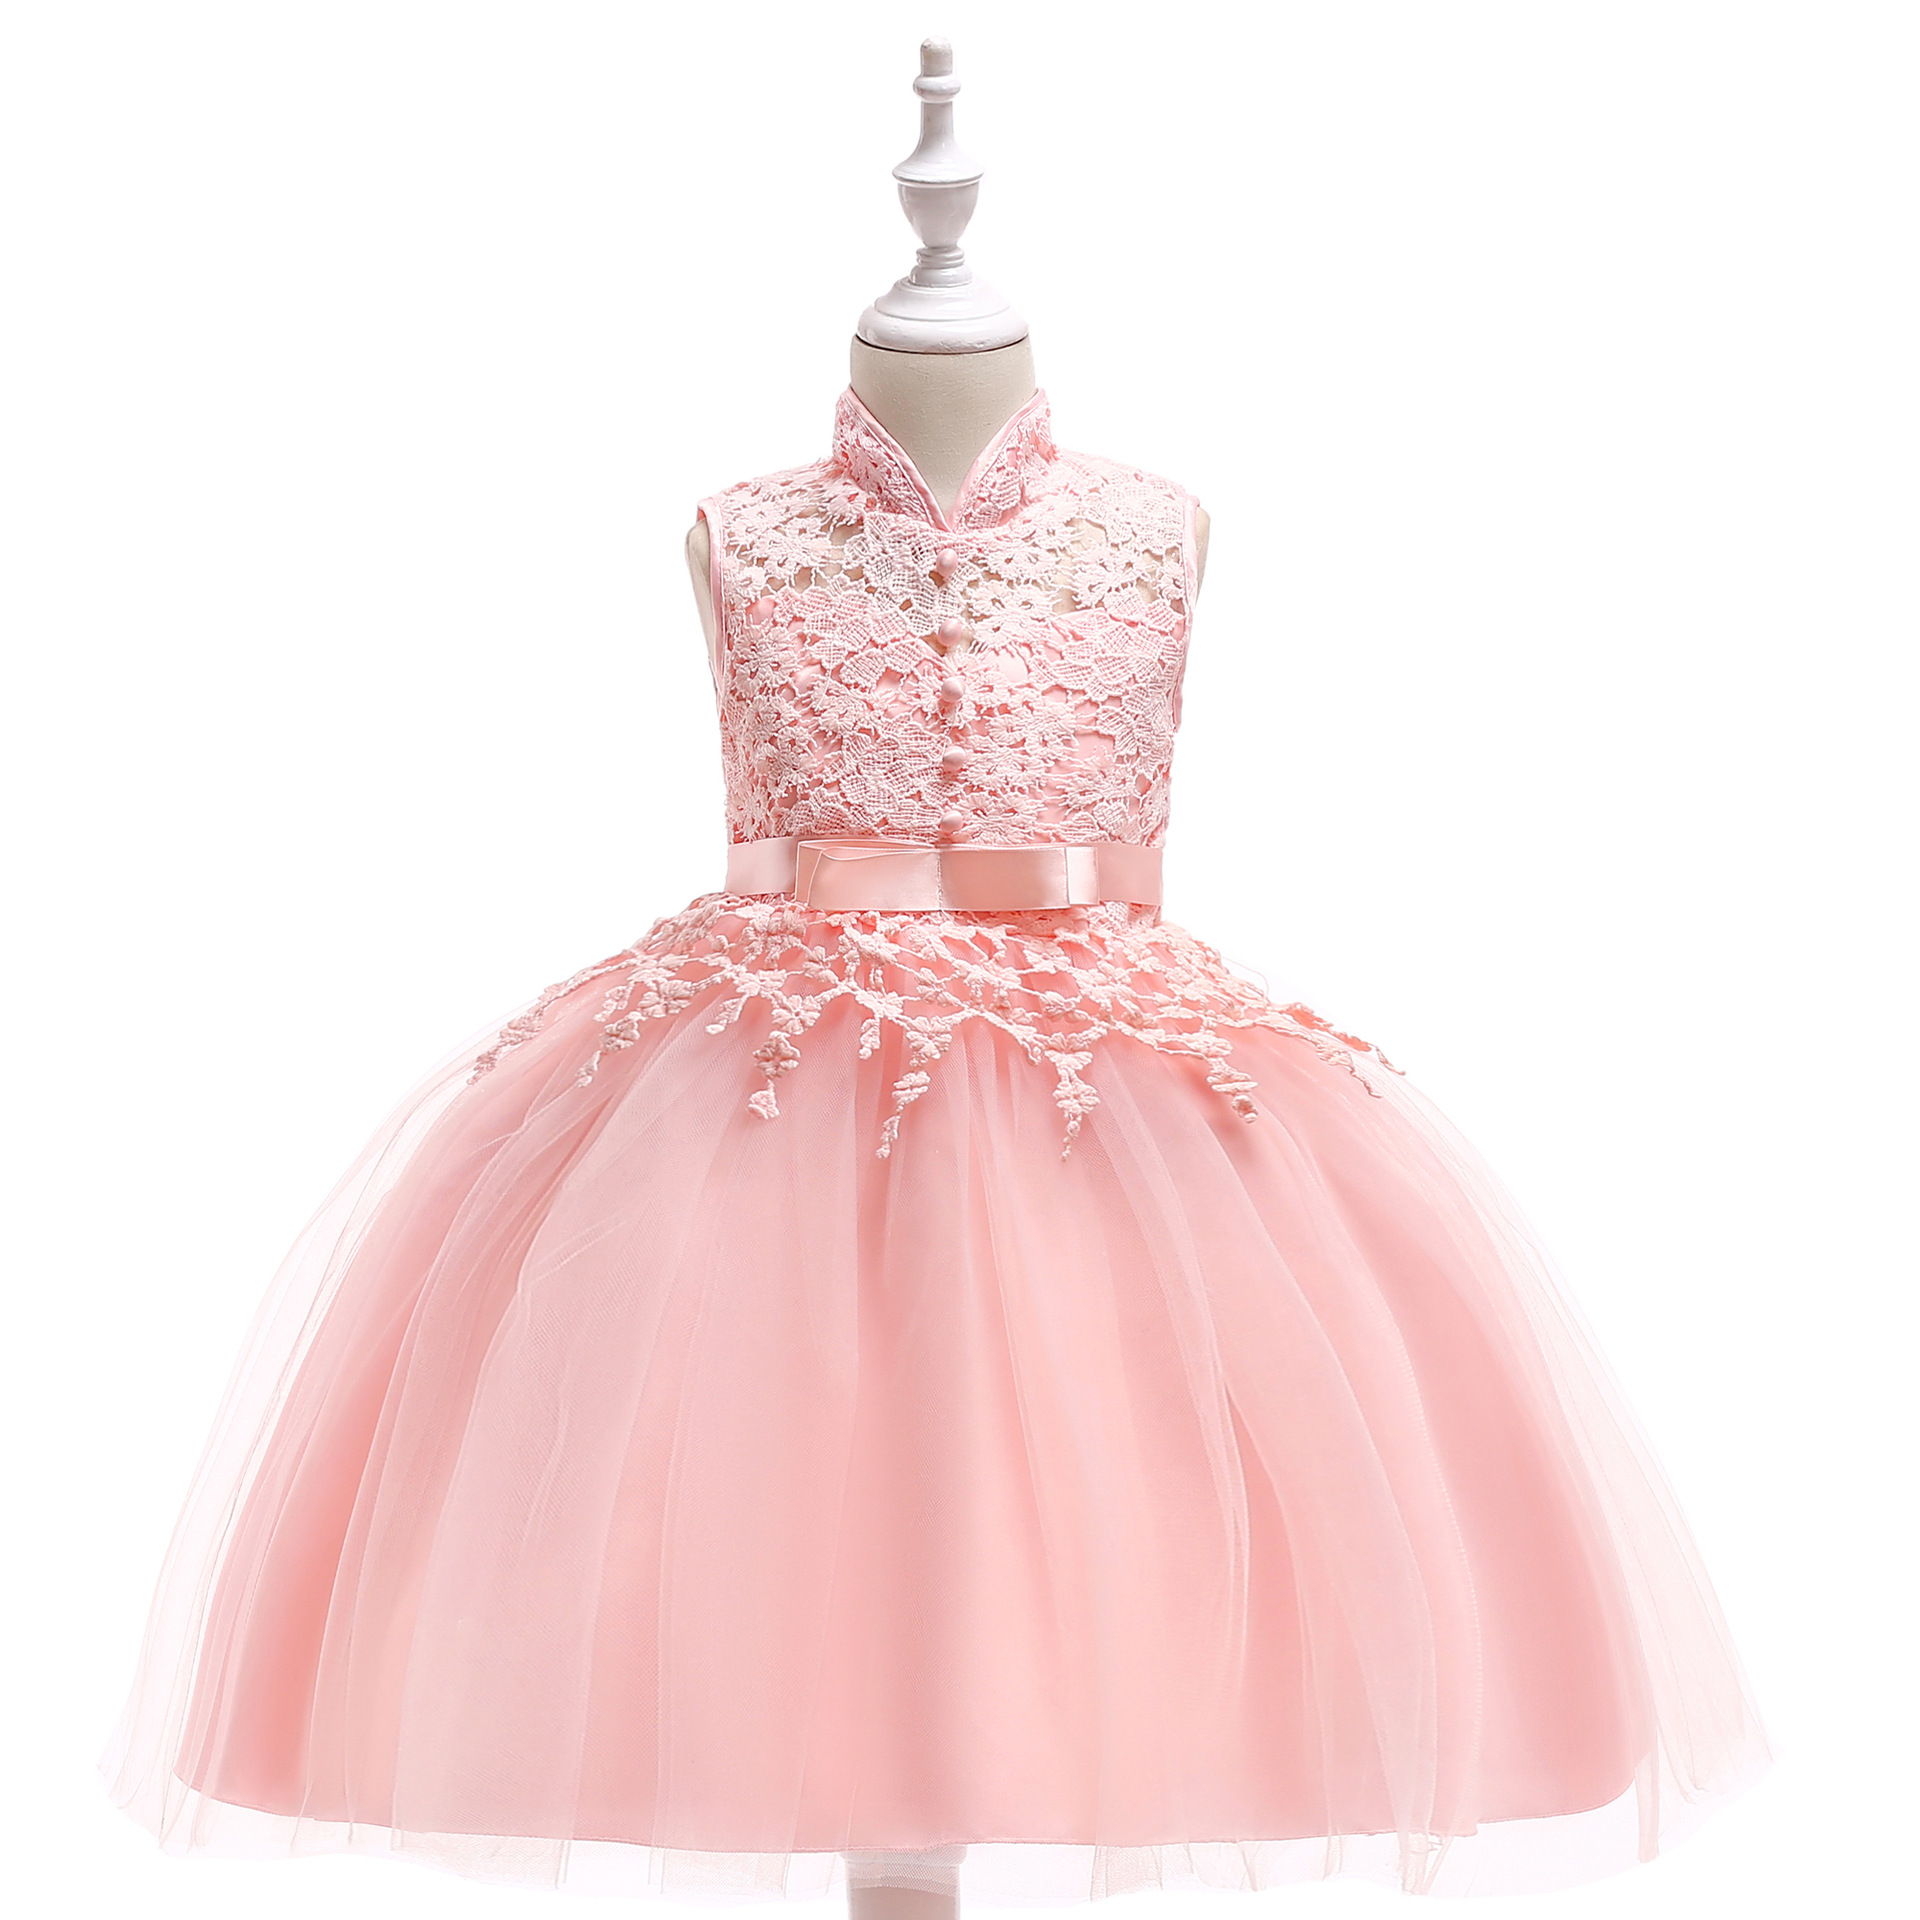 Girls Princess Dress Sleeveless 2019 Summer New Style Dresses Of Bride Fellow Kids Big Boy Piano Performance Wear Puffy Dress